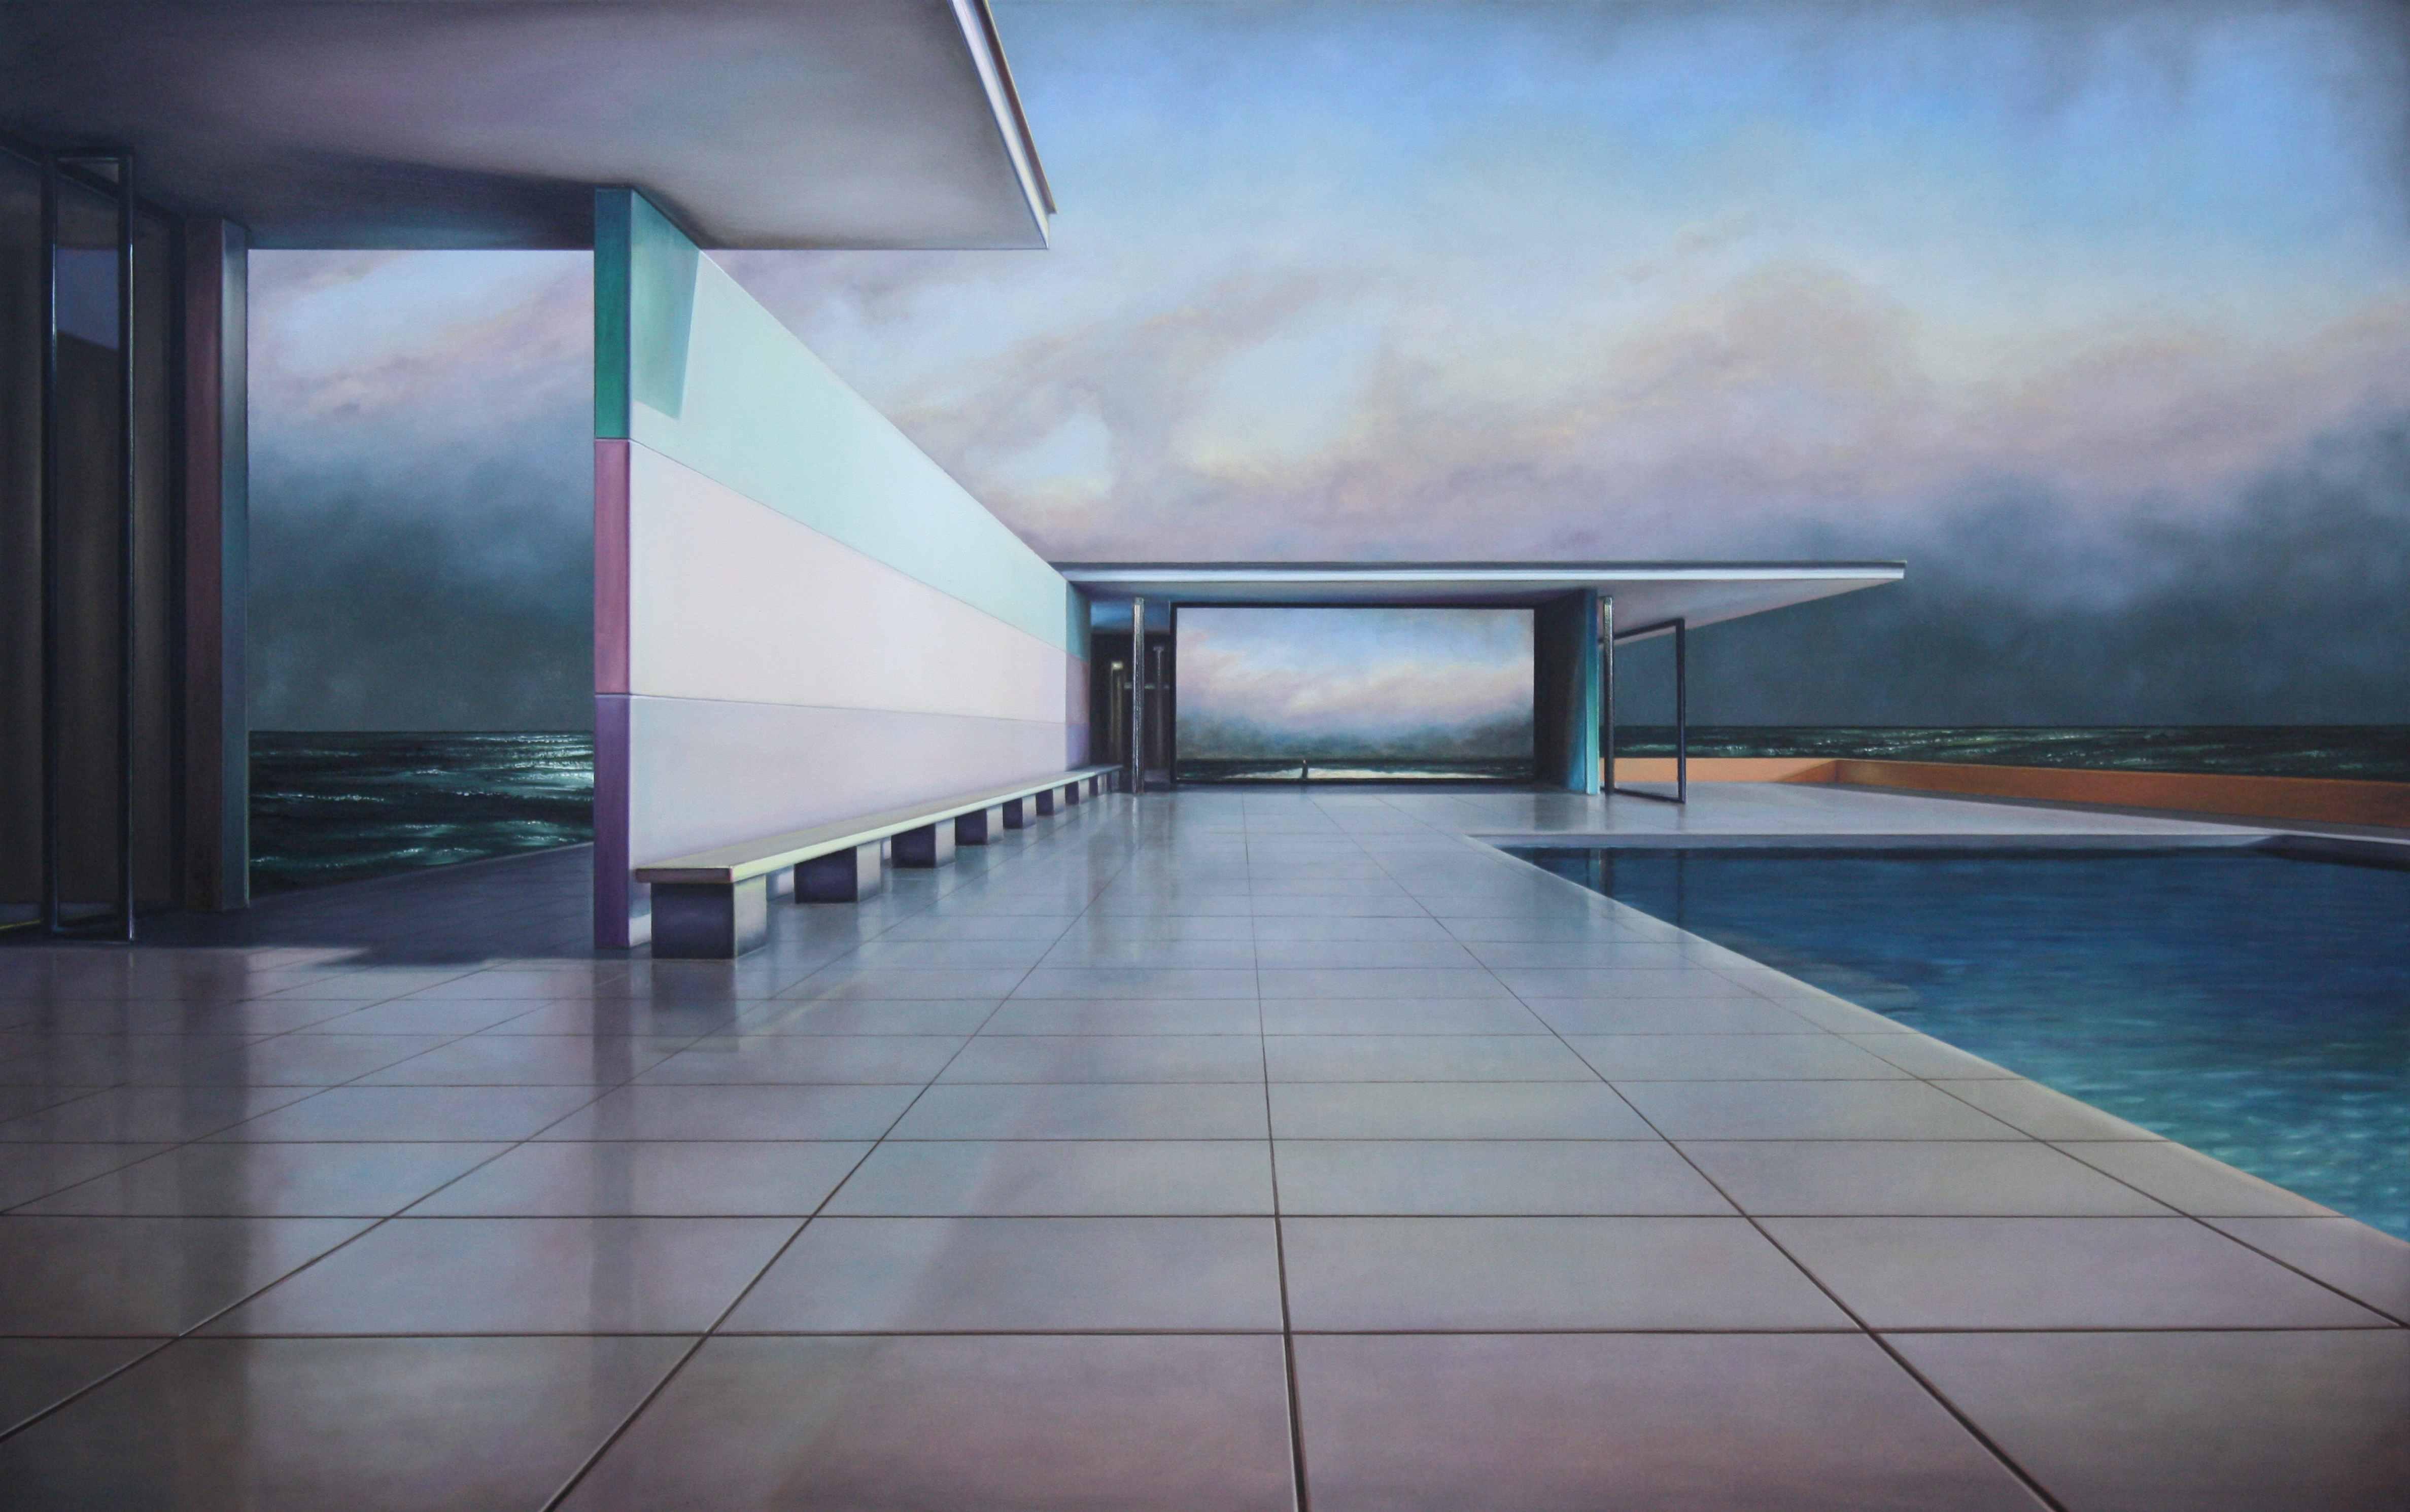 Pavillon (C.D.Friedrich), 2018, 120x190cm, Öl auf Leinwand, presented by Galerie Augarde